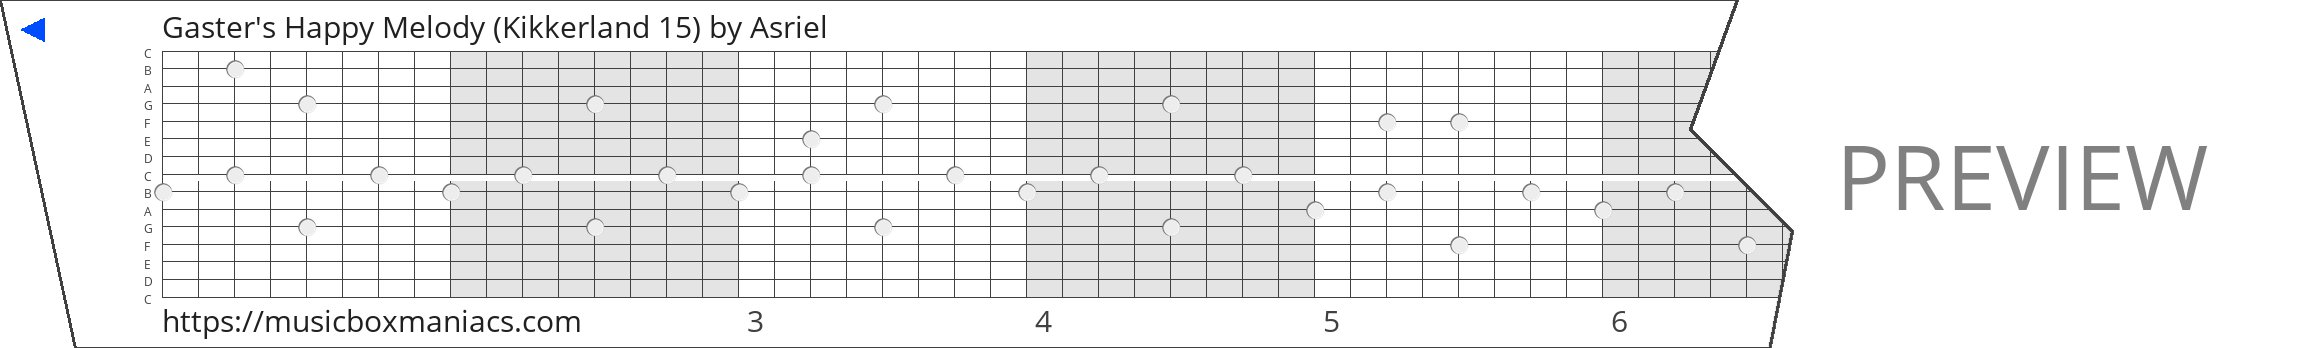 Gaster's Happy Melody (Kikkerland 15) 15 note music box paper strip